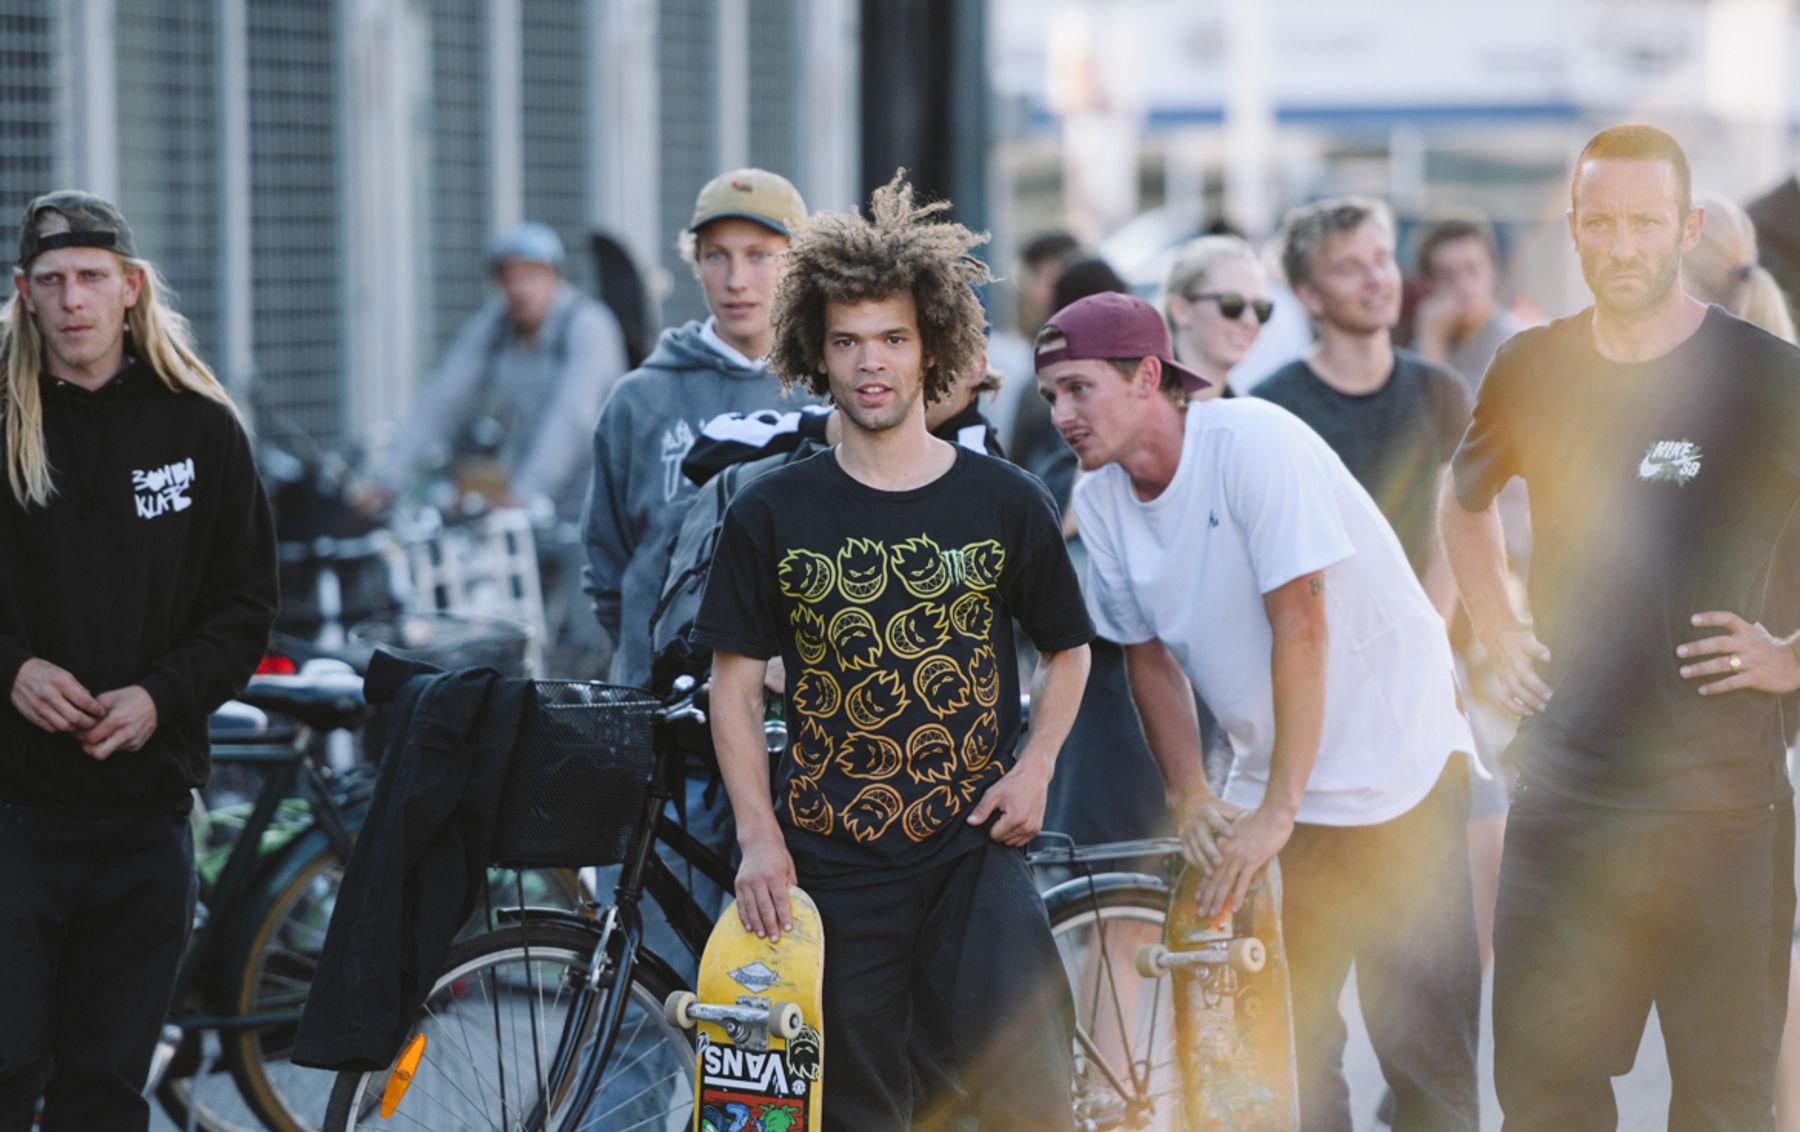 _IHC4072e-Nassim-Guammaz-Tim-Zom-Daniel-Lebron-Nike-SB-Copenhagen-Open-Ledges-Meat-Packing-District-Day-2-July-2015-Photographer-Maksim-Kalanep